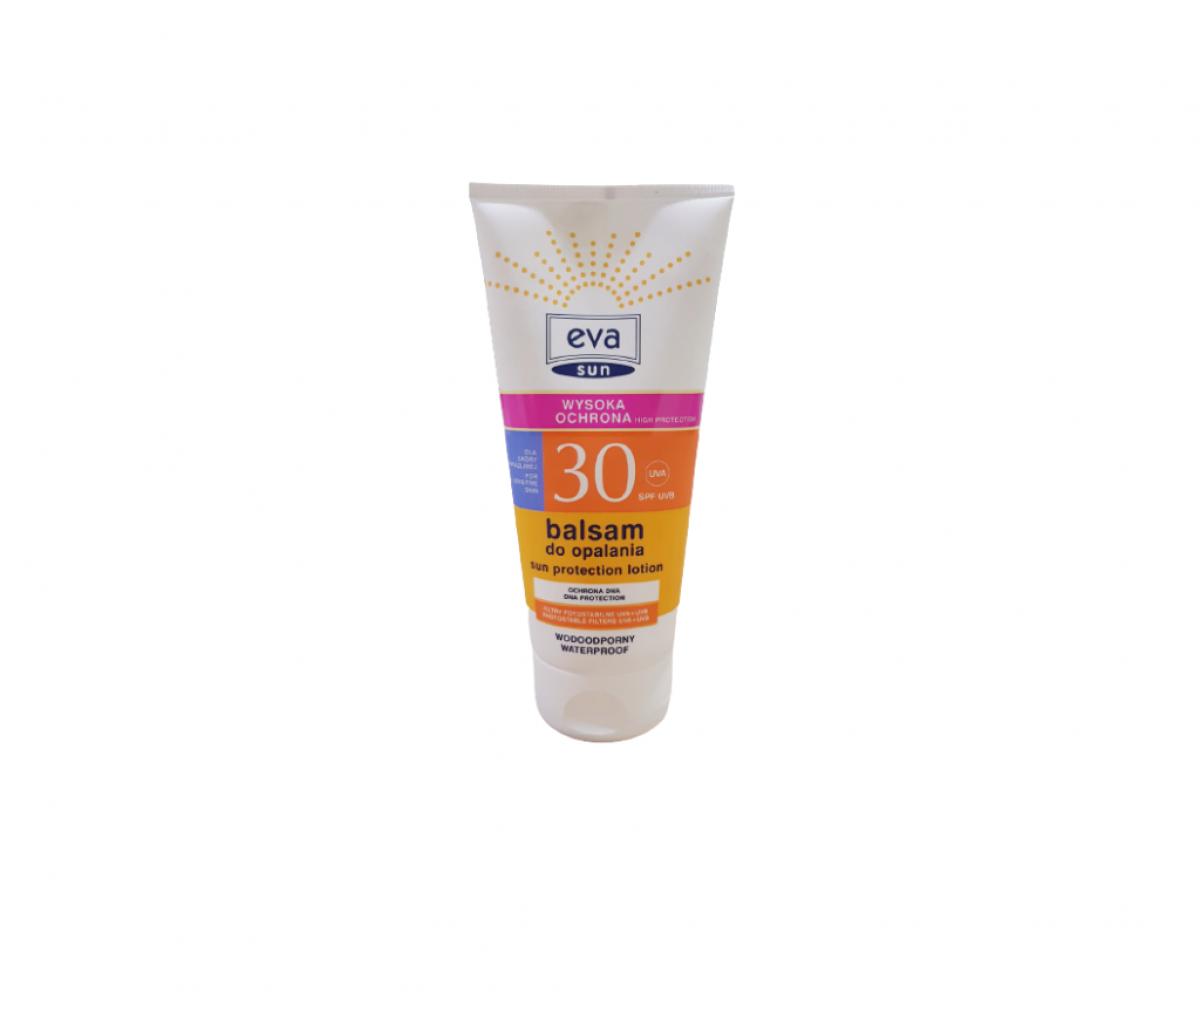 TZMO EVA Sun SPF30 Tanning Lotion for Sensitive Skin 200ml